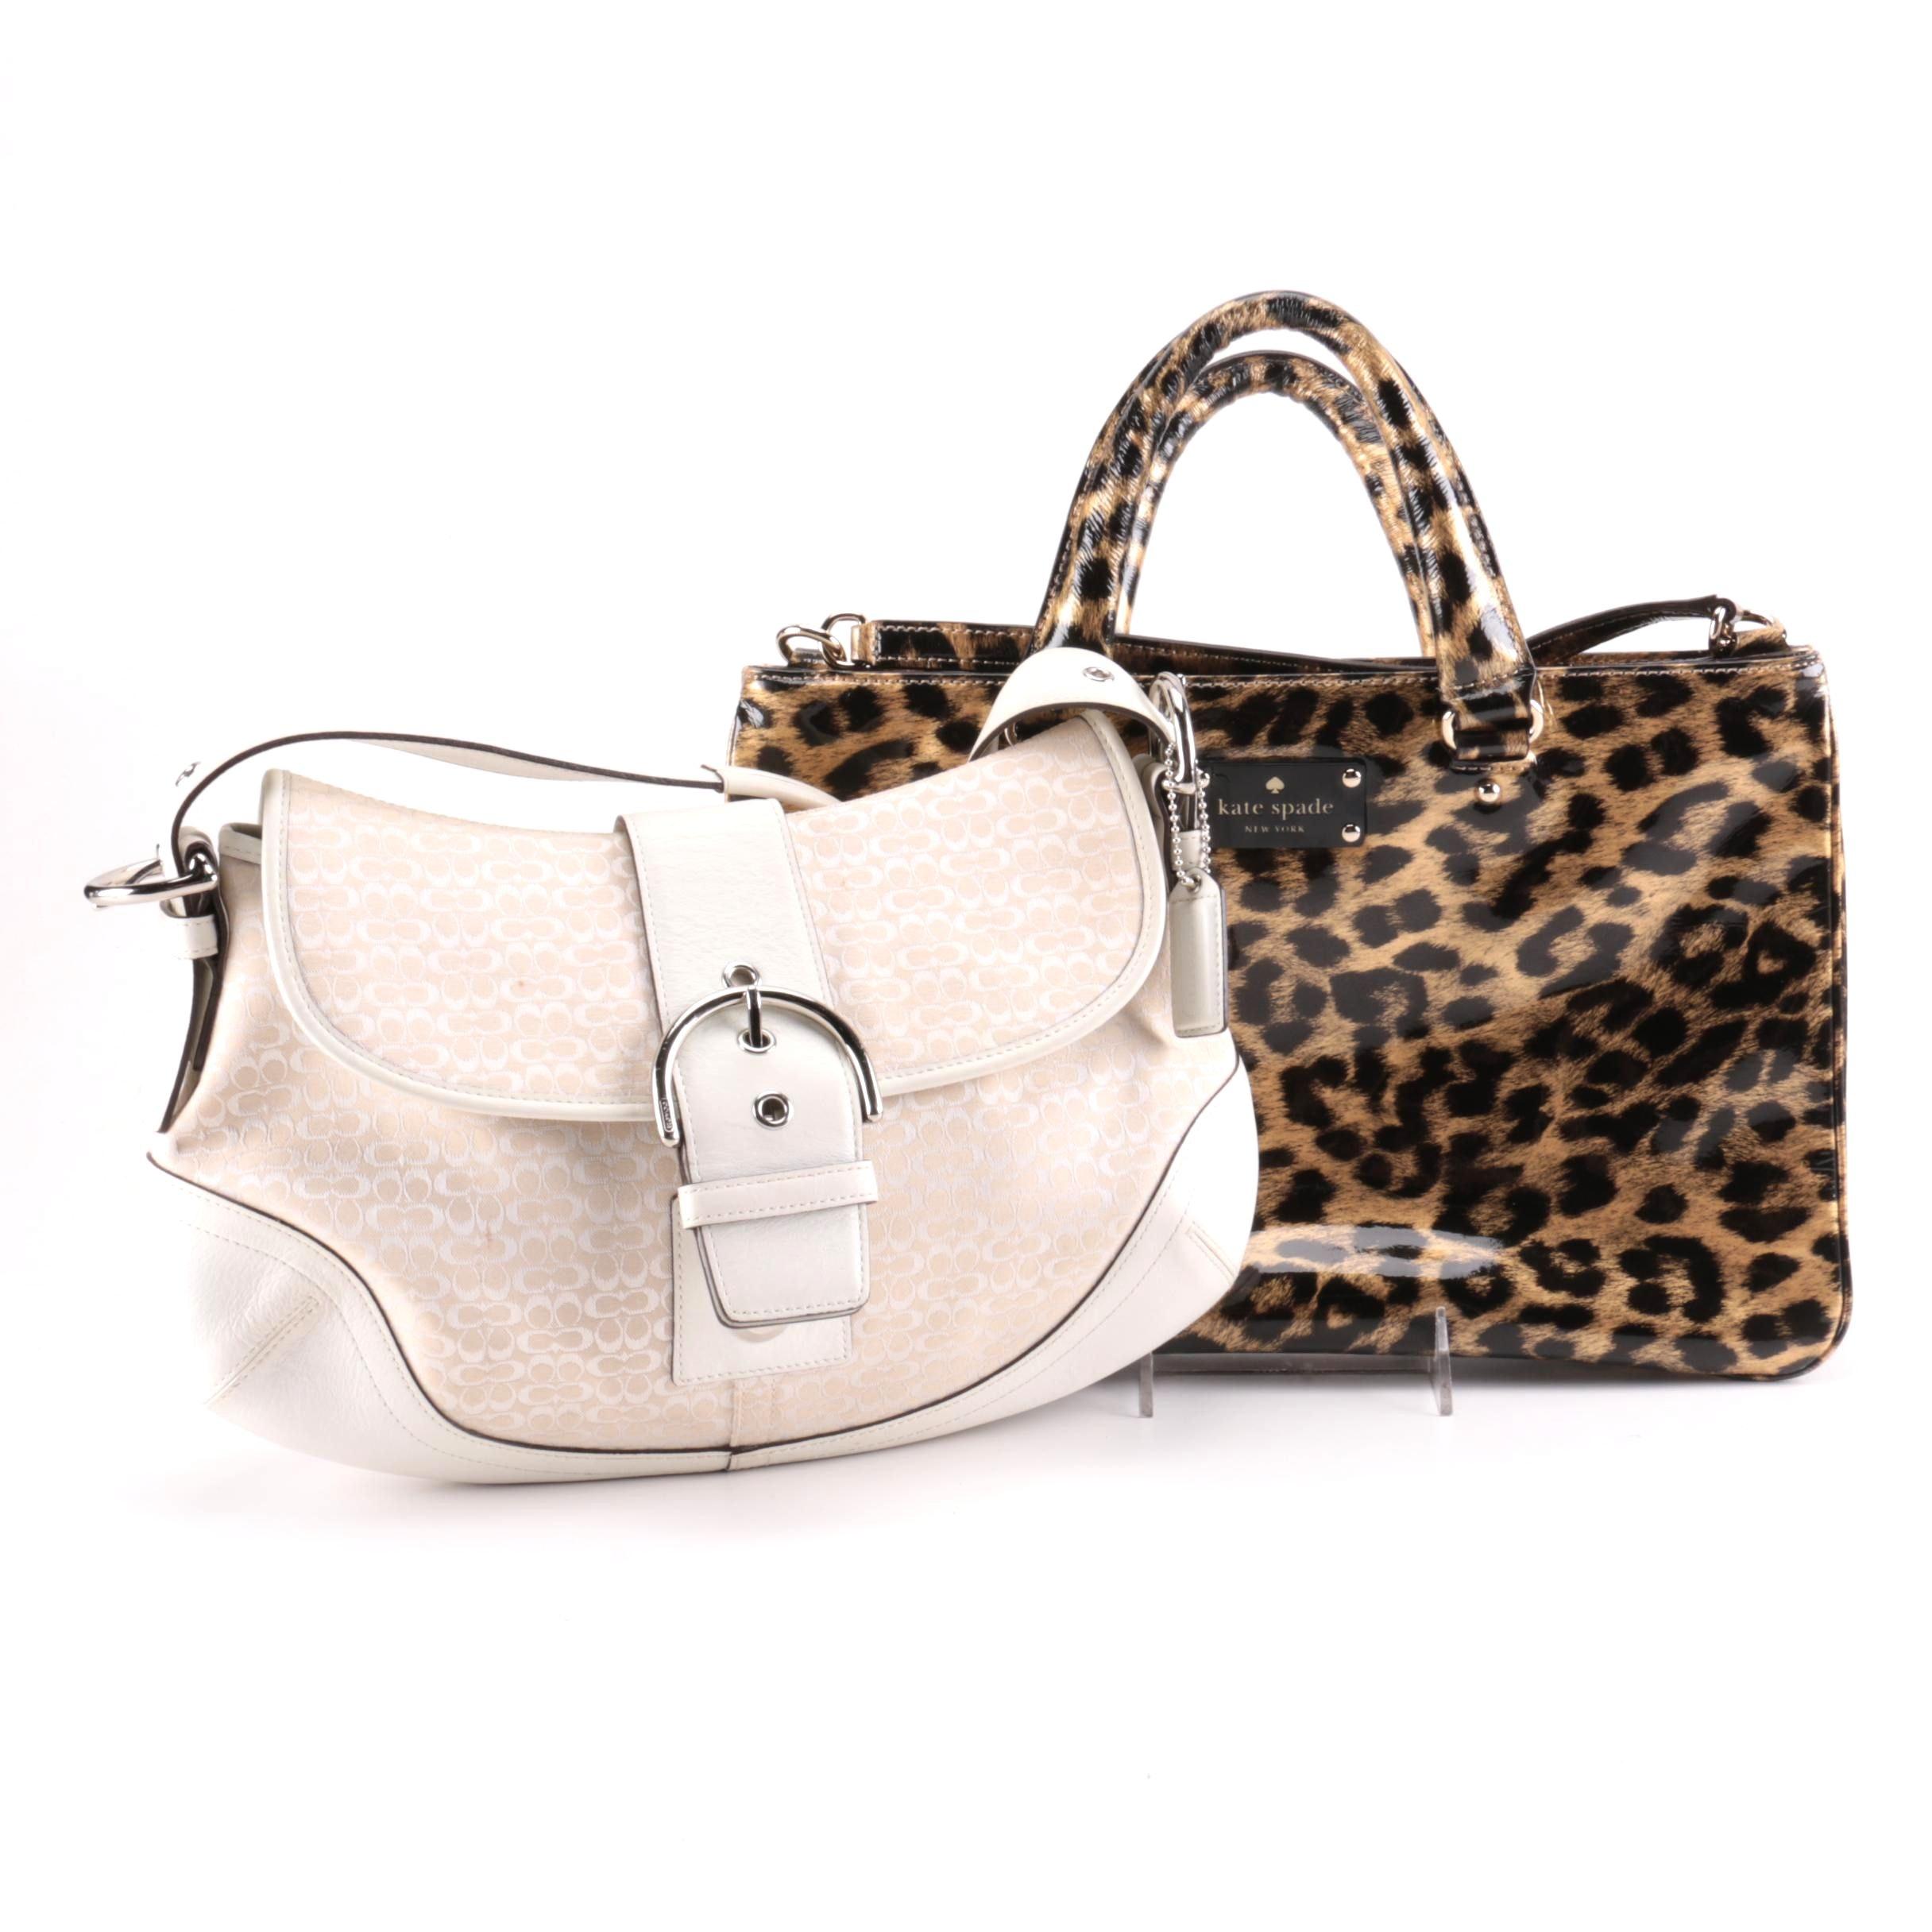 Coach Demi Hobo Shoulder Bag and Kate Spade Brett Leopard Print Purse